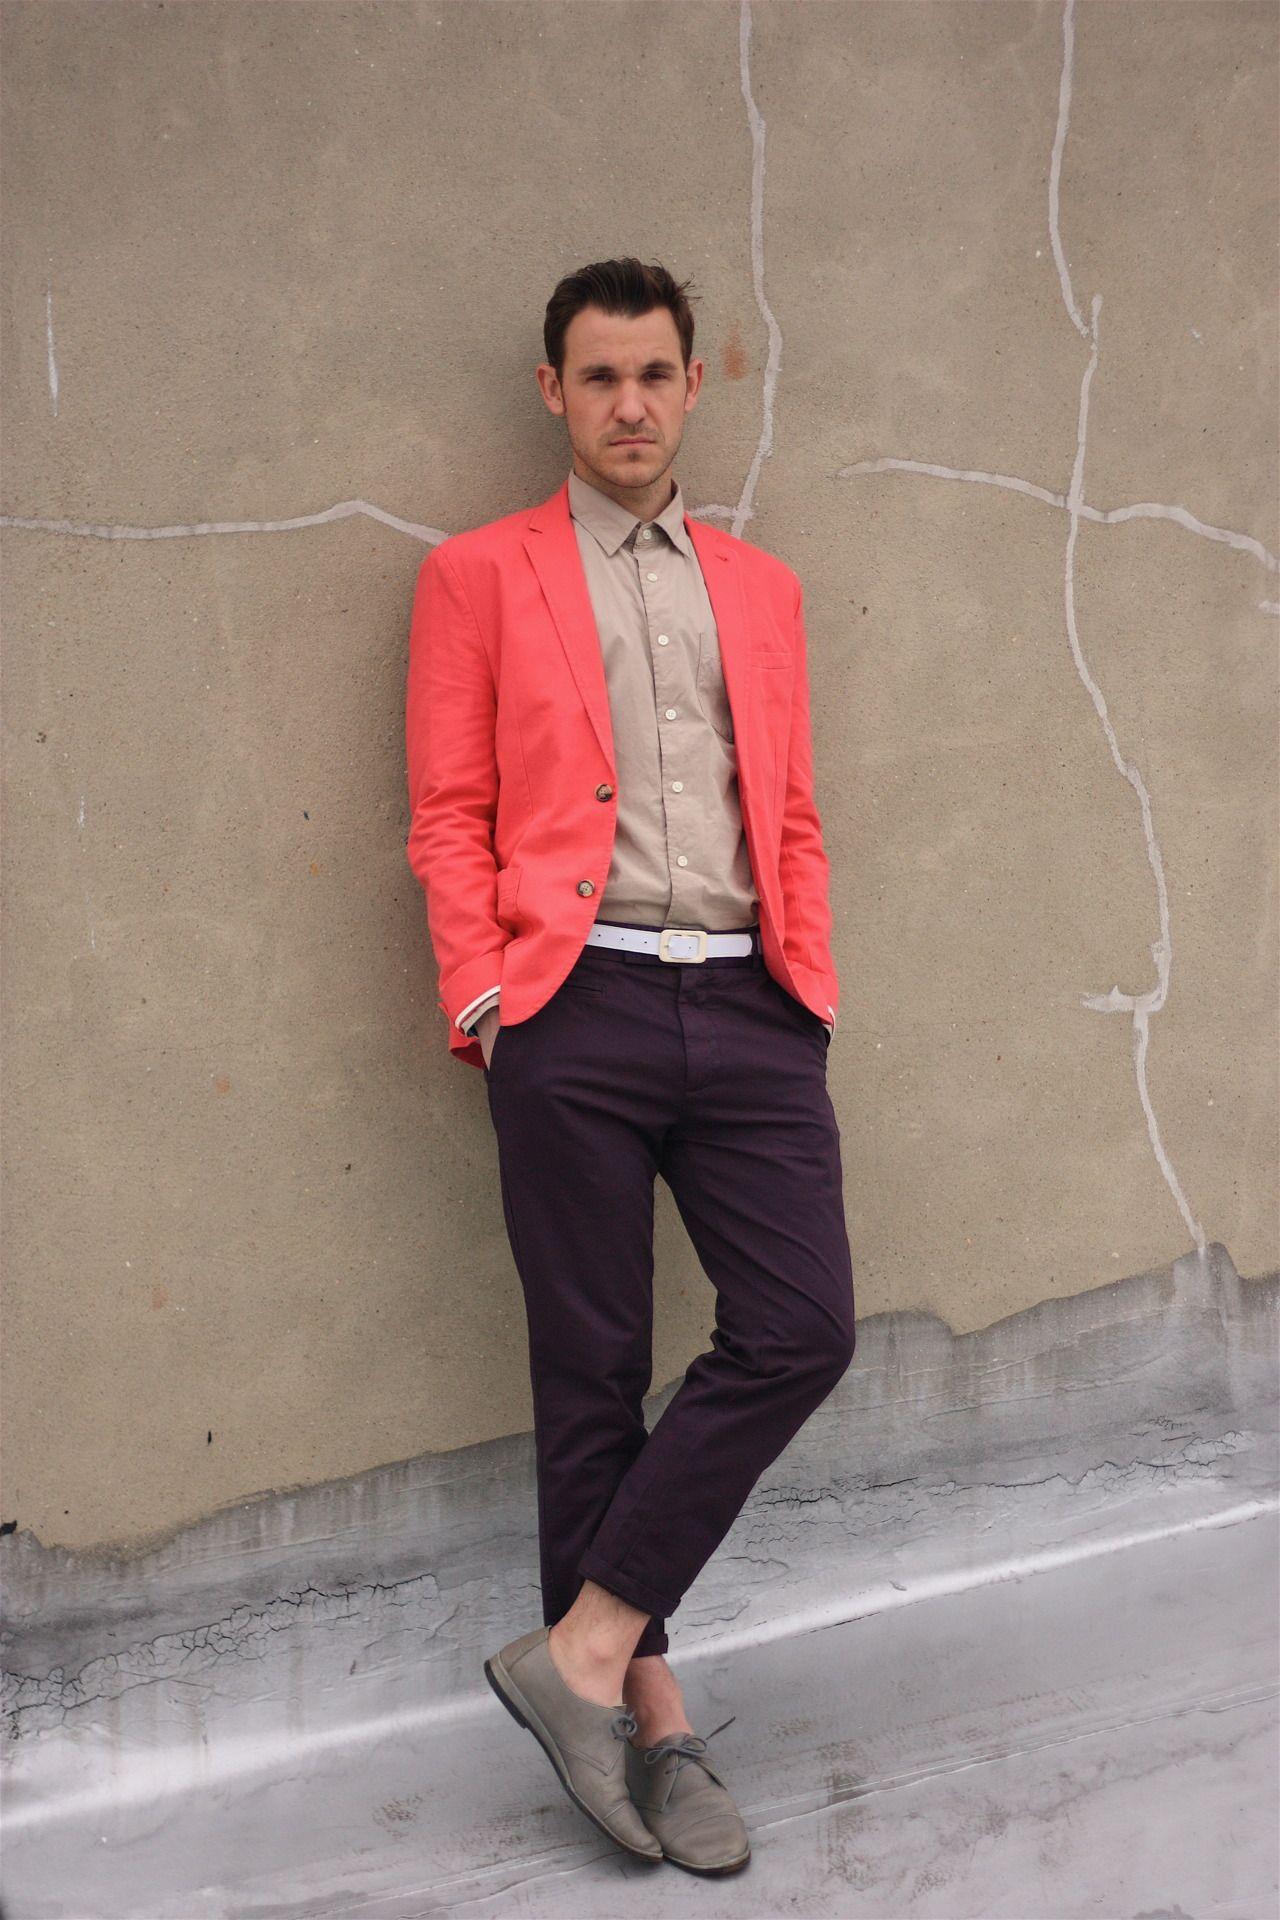 Bold Men's Ensemble via Men's Style | Men's Style | Pinterest ...